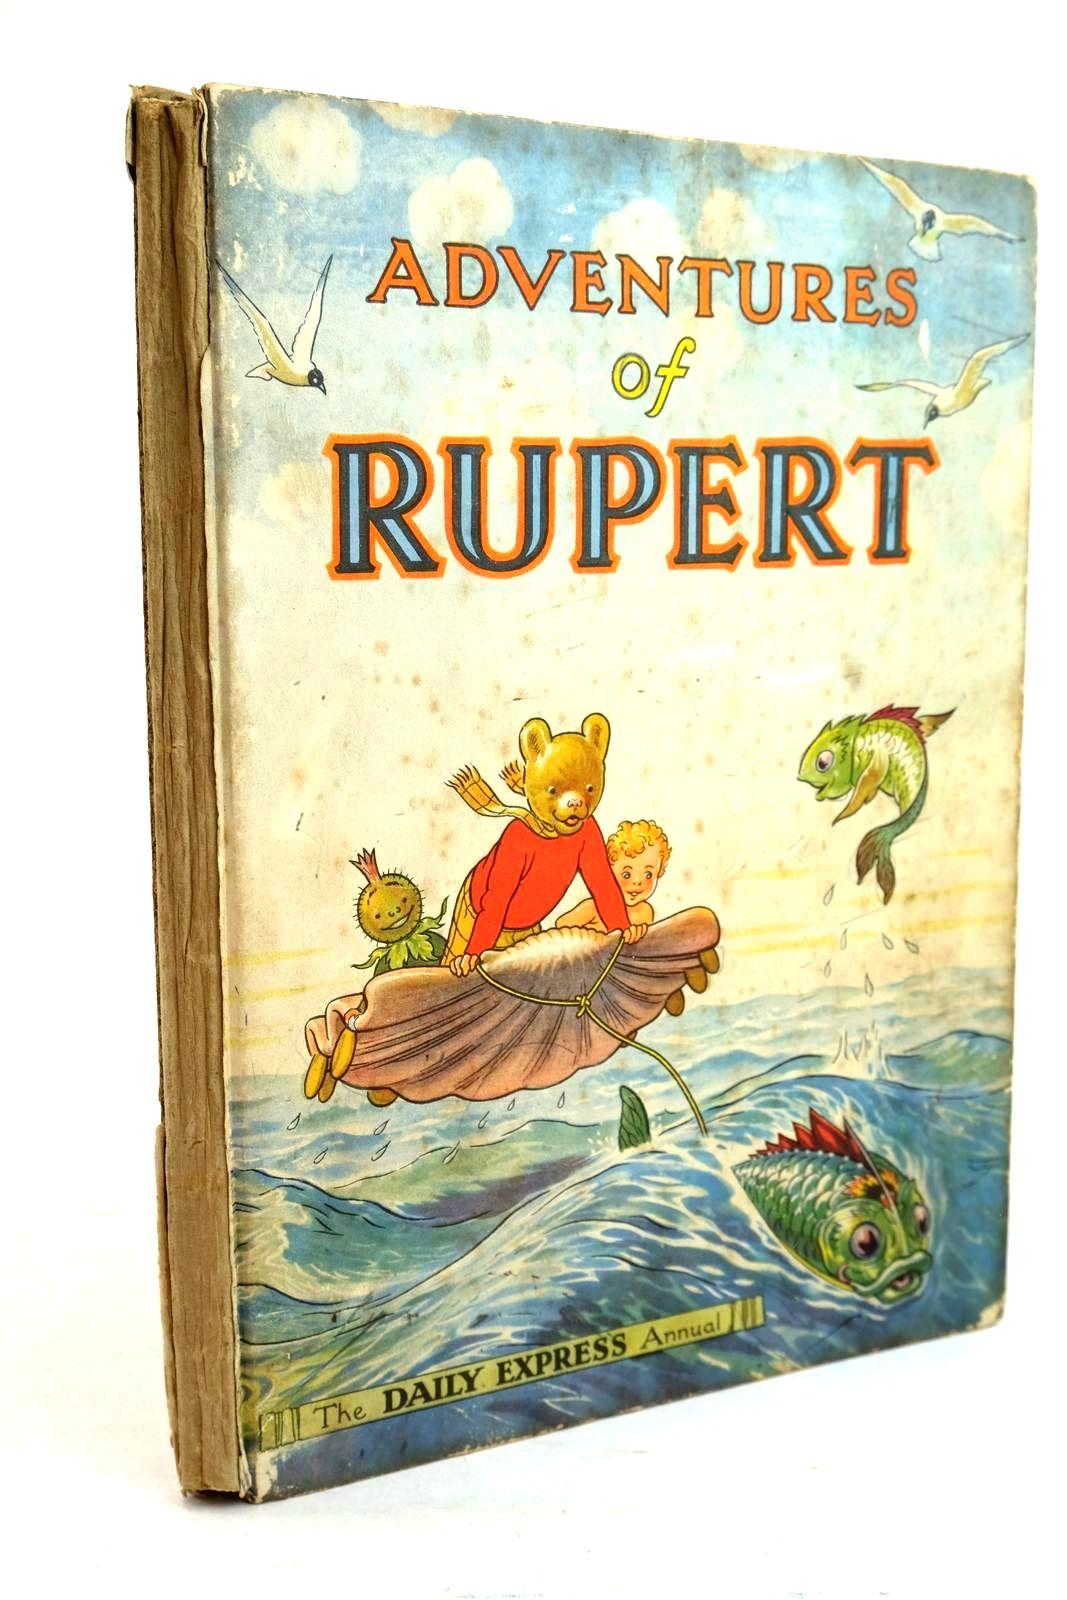 Photo of RUPERT ANNUAL 1950 - ADVENTURES OF RUPERT- Stock Number: 1320665